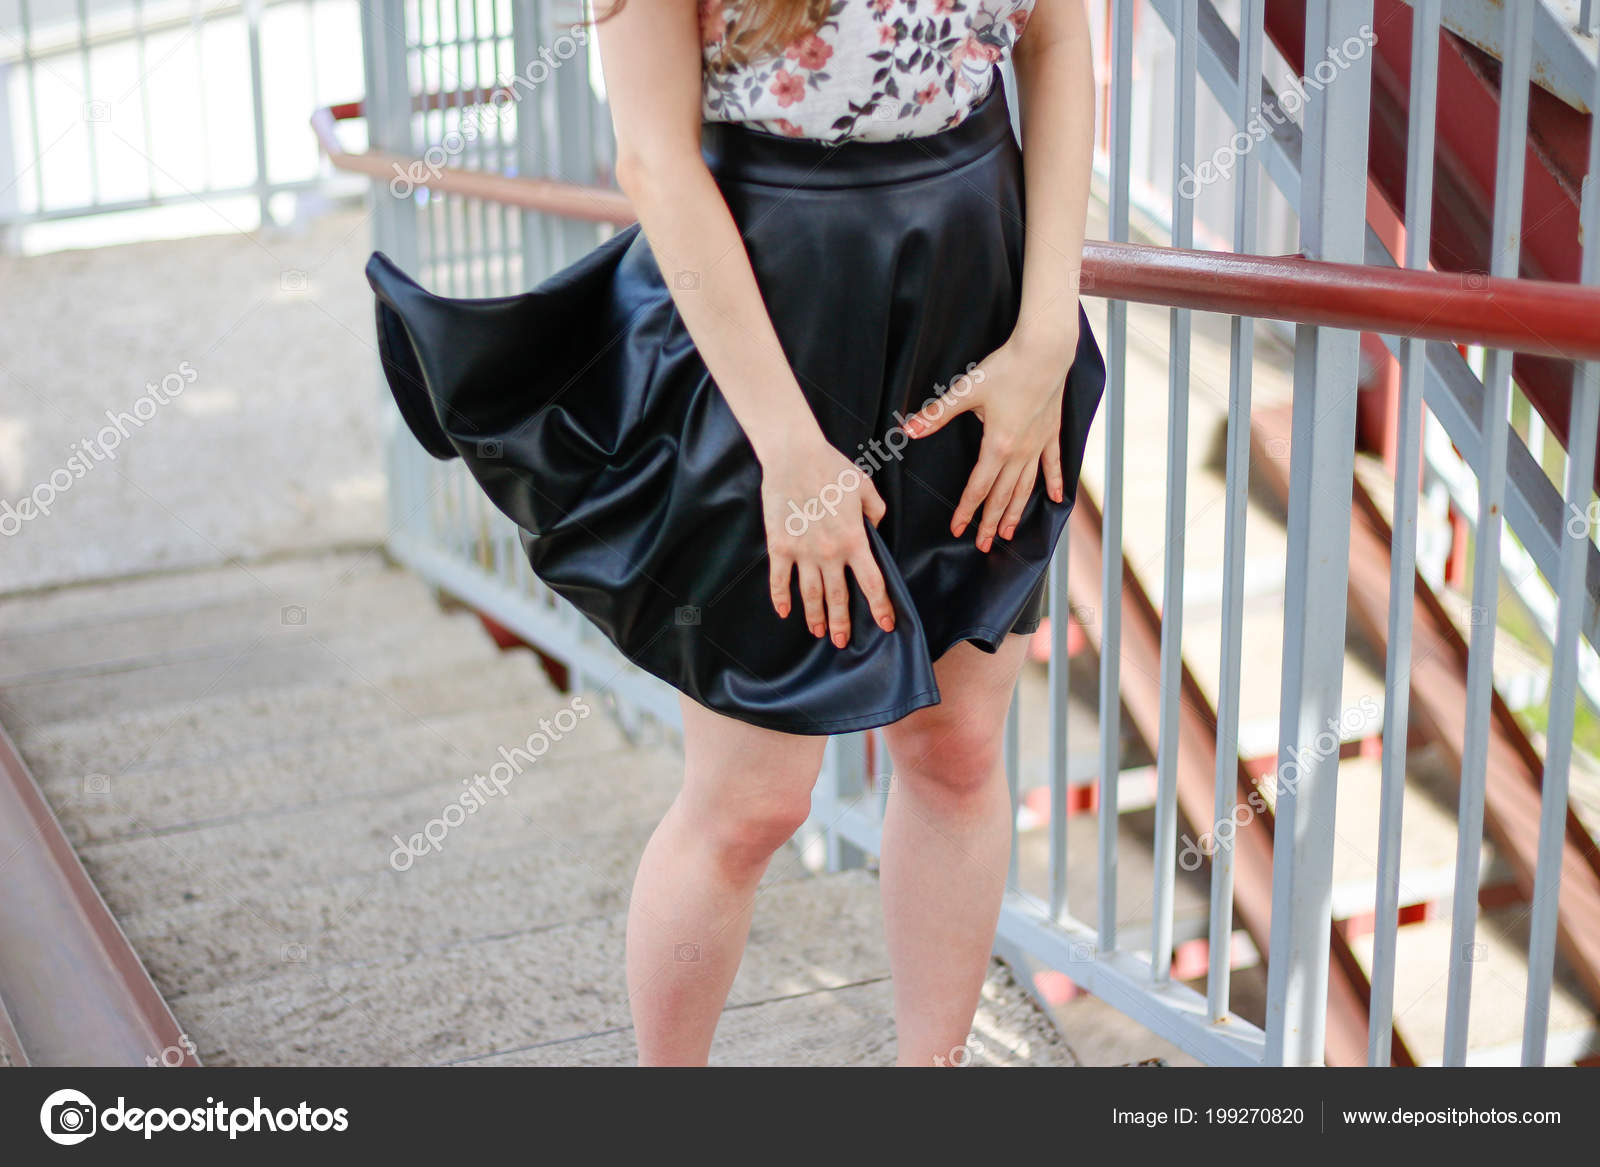 Трах фото красивые ножки на улице юбки на ветру зарринг